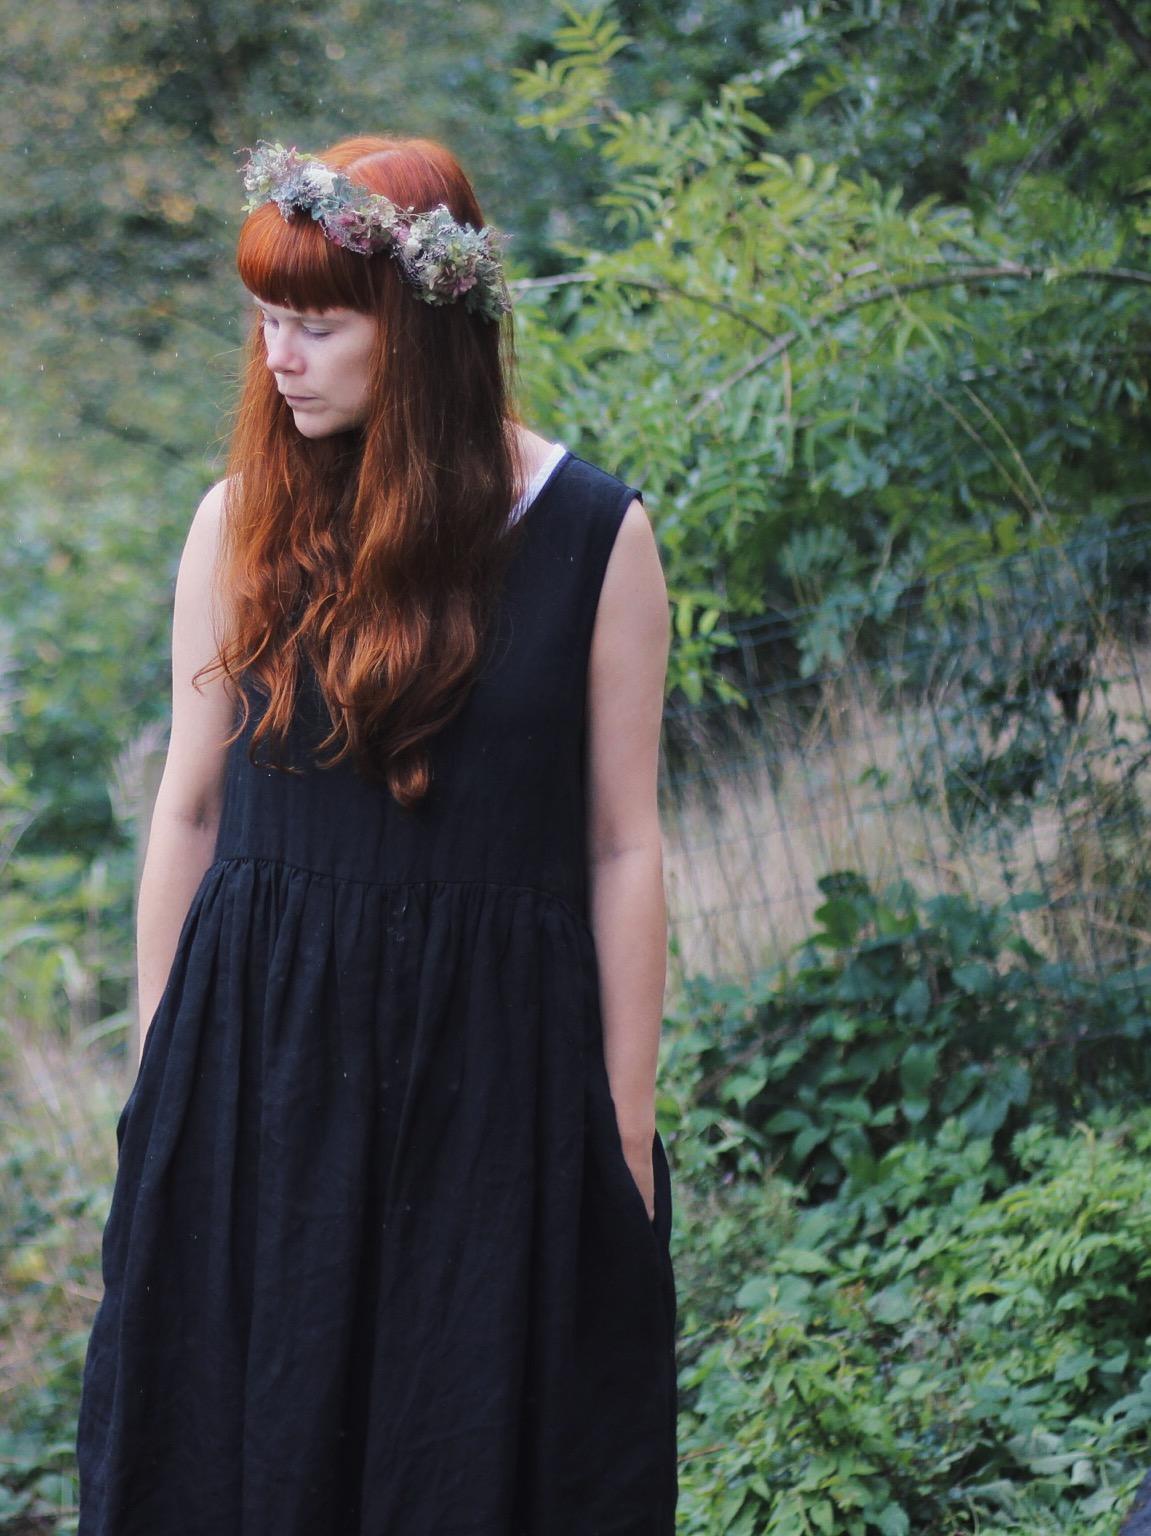 Girl wearing black linen dress